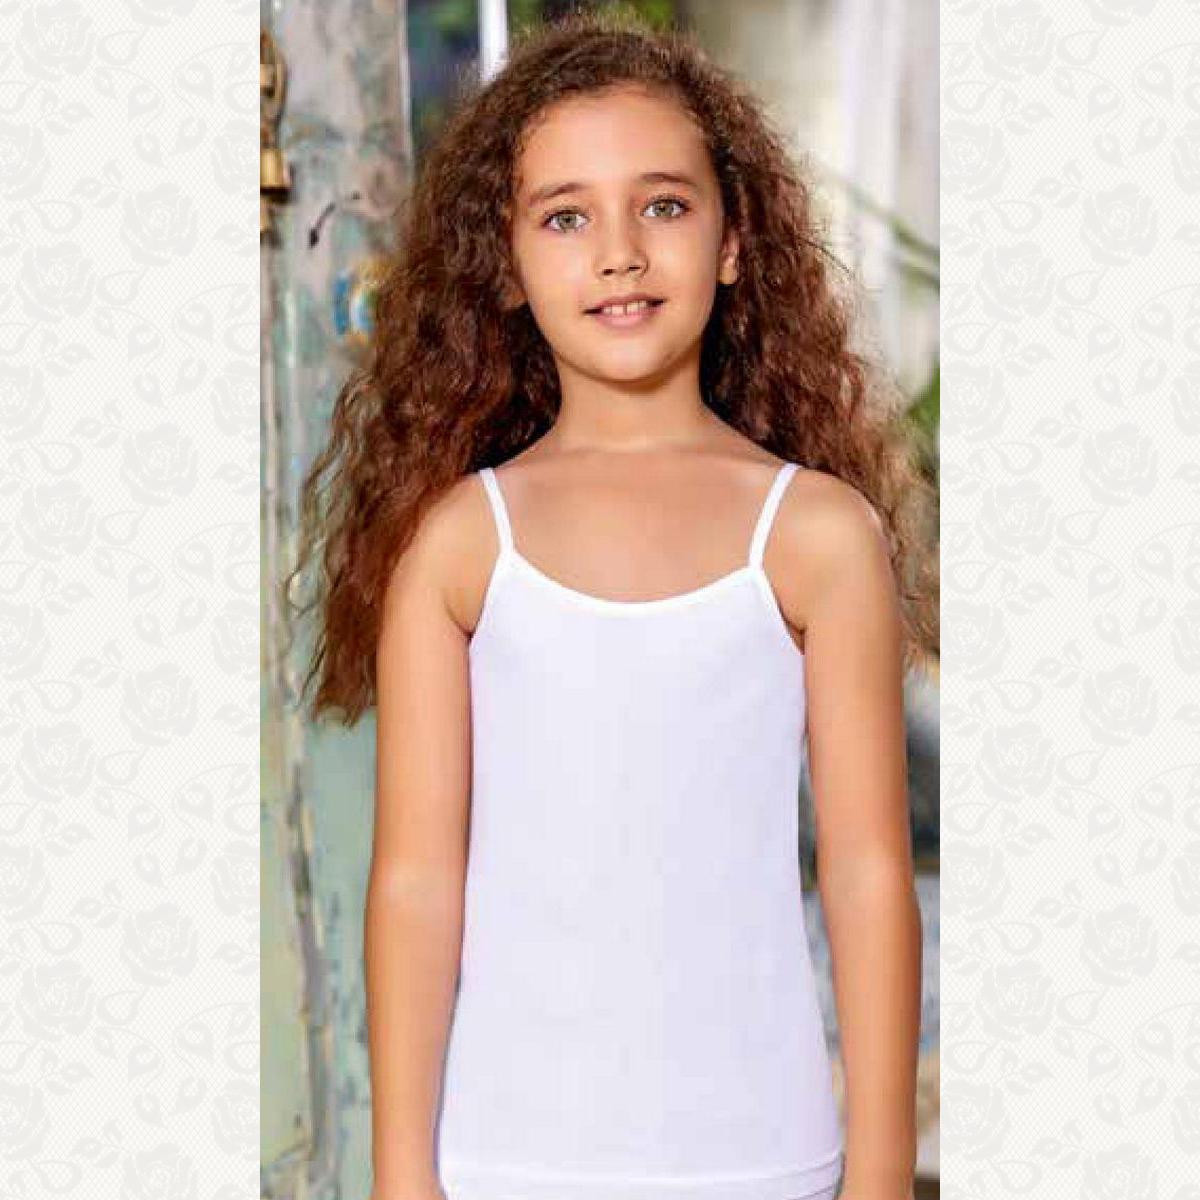 Майка для девочки размер от 4-6, цвет белый с фото, 6 шт.